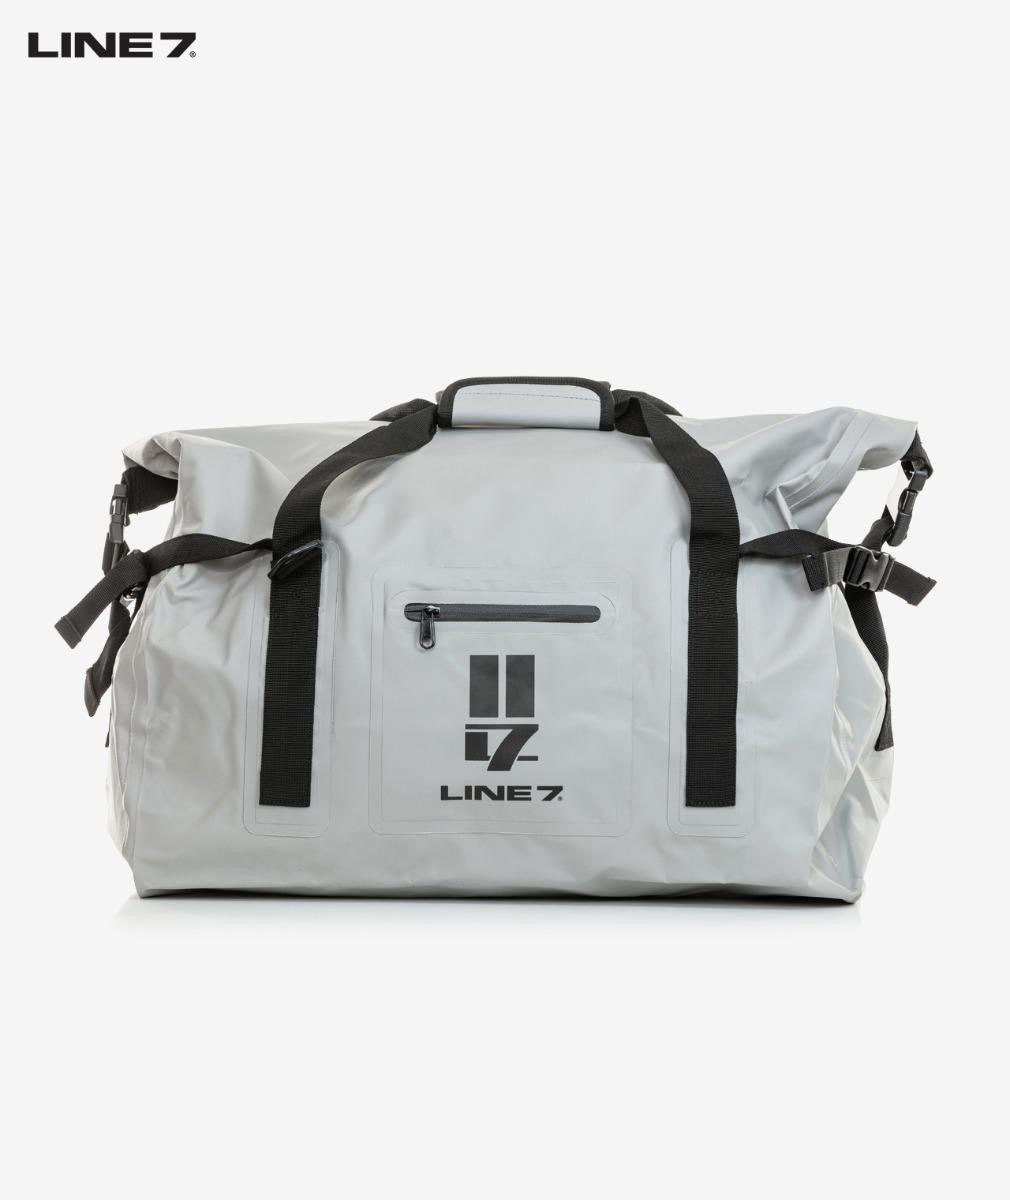 Line 7 Waterproof Duffle Bag 50L